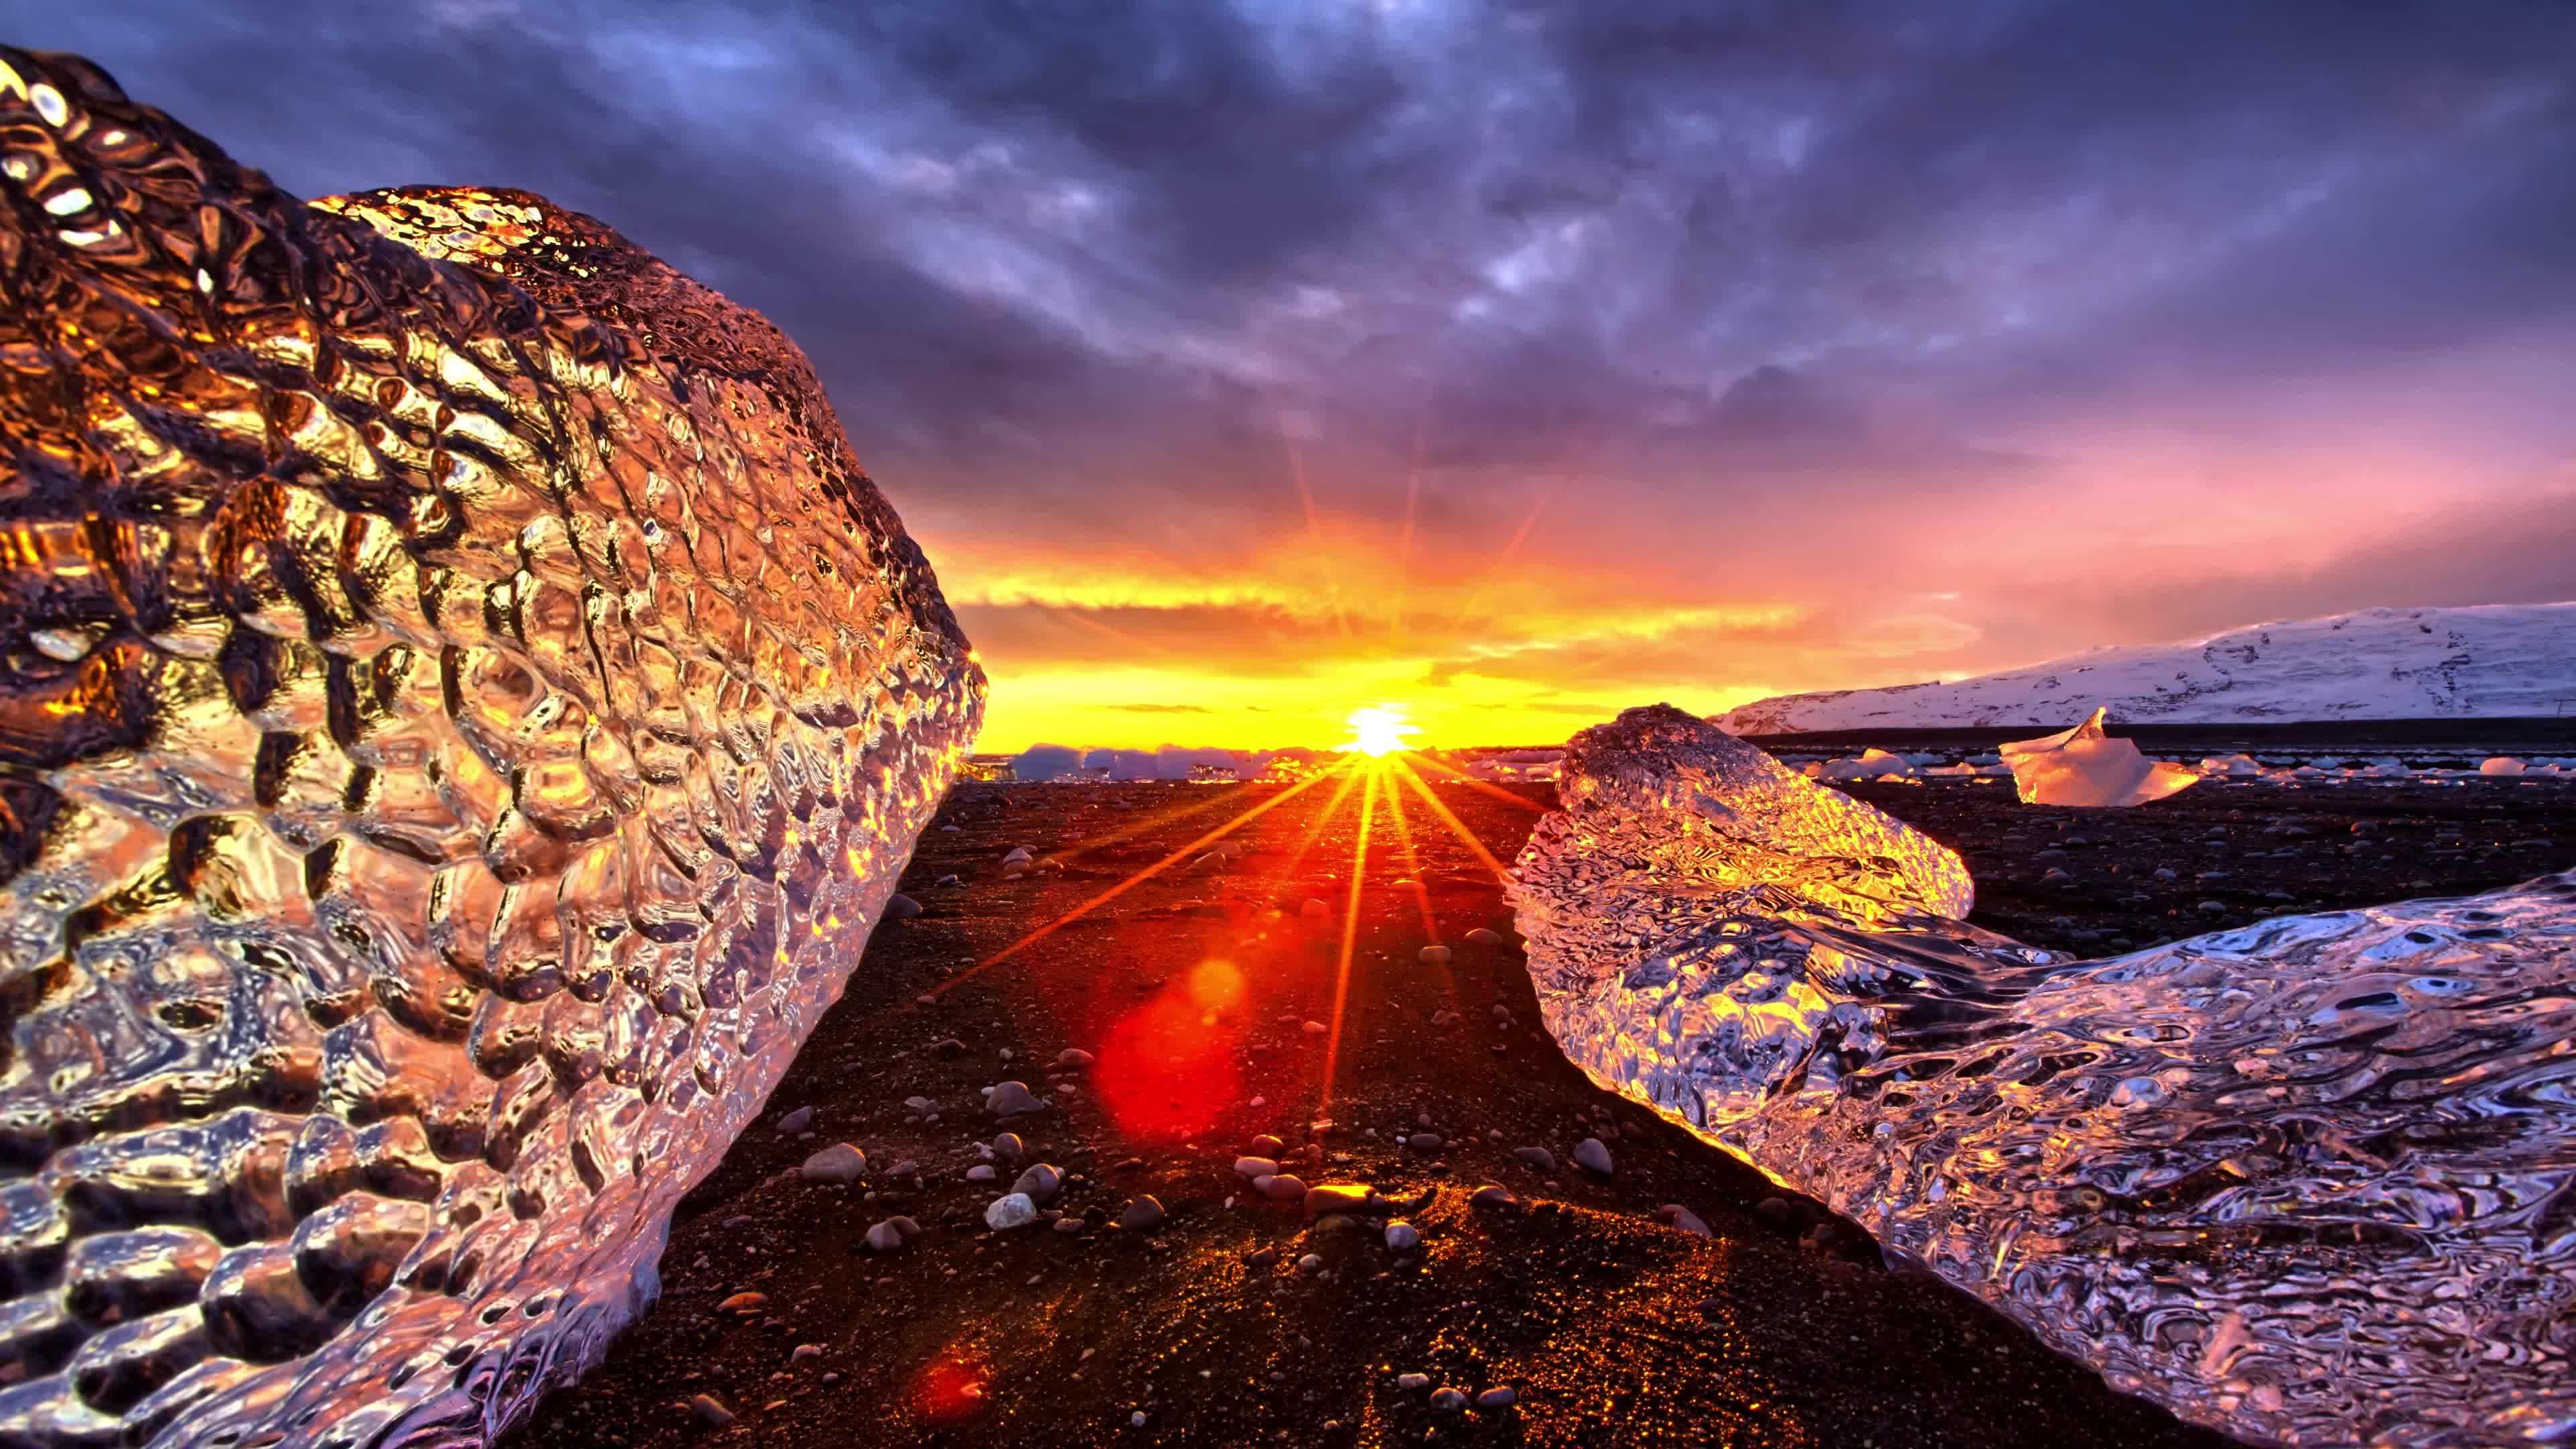 #weathergifs, WeatherGifs, Iceland in 8k GIFs